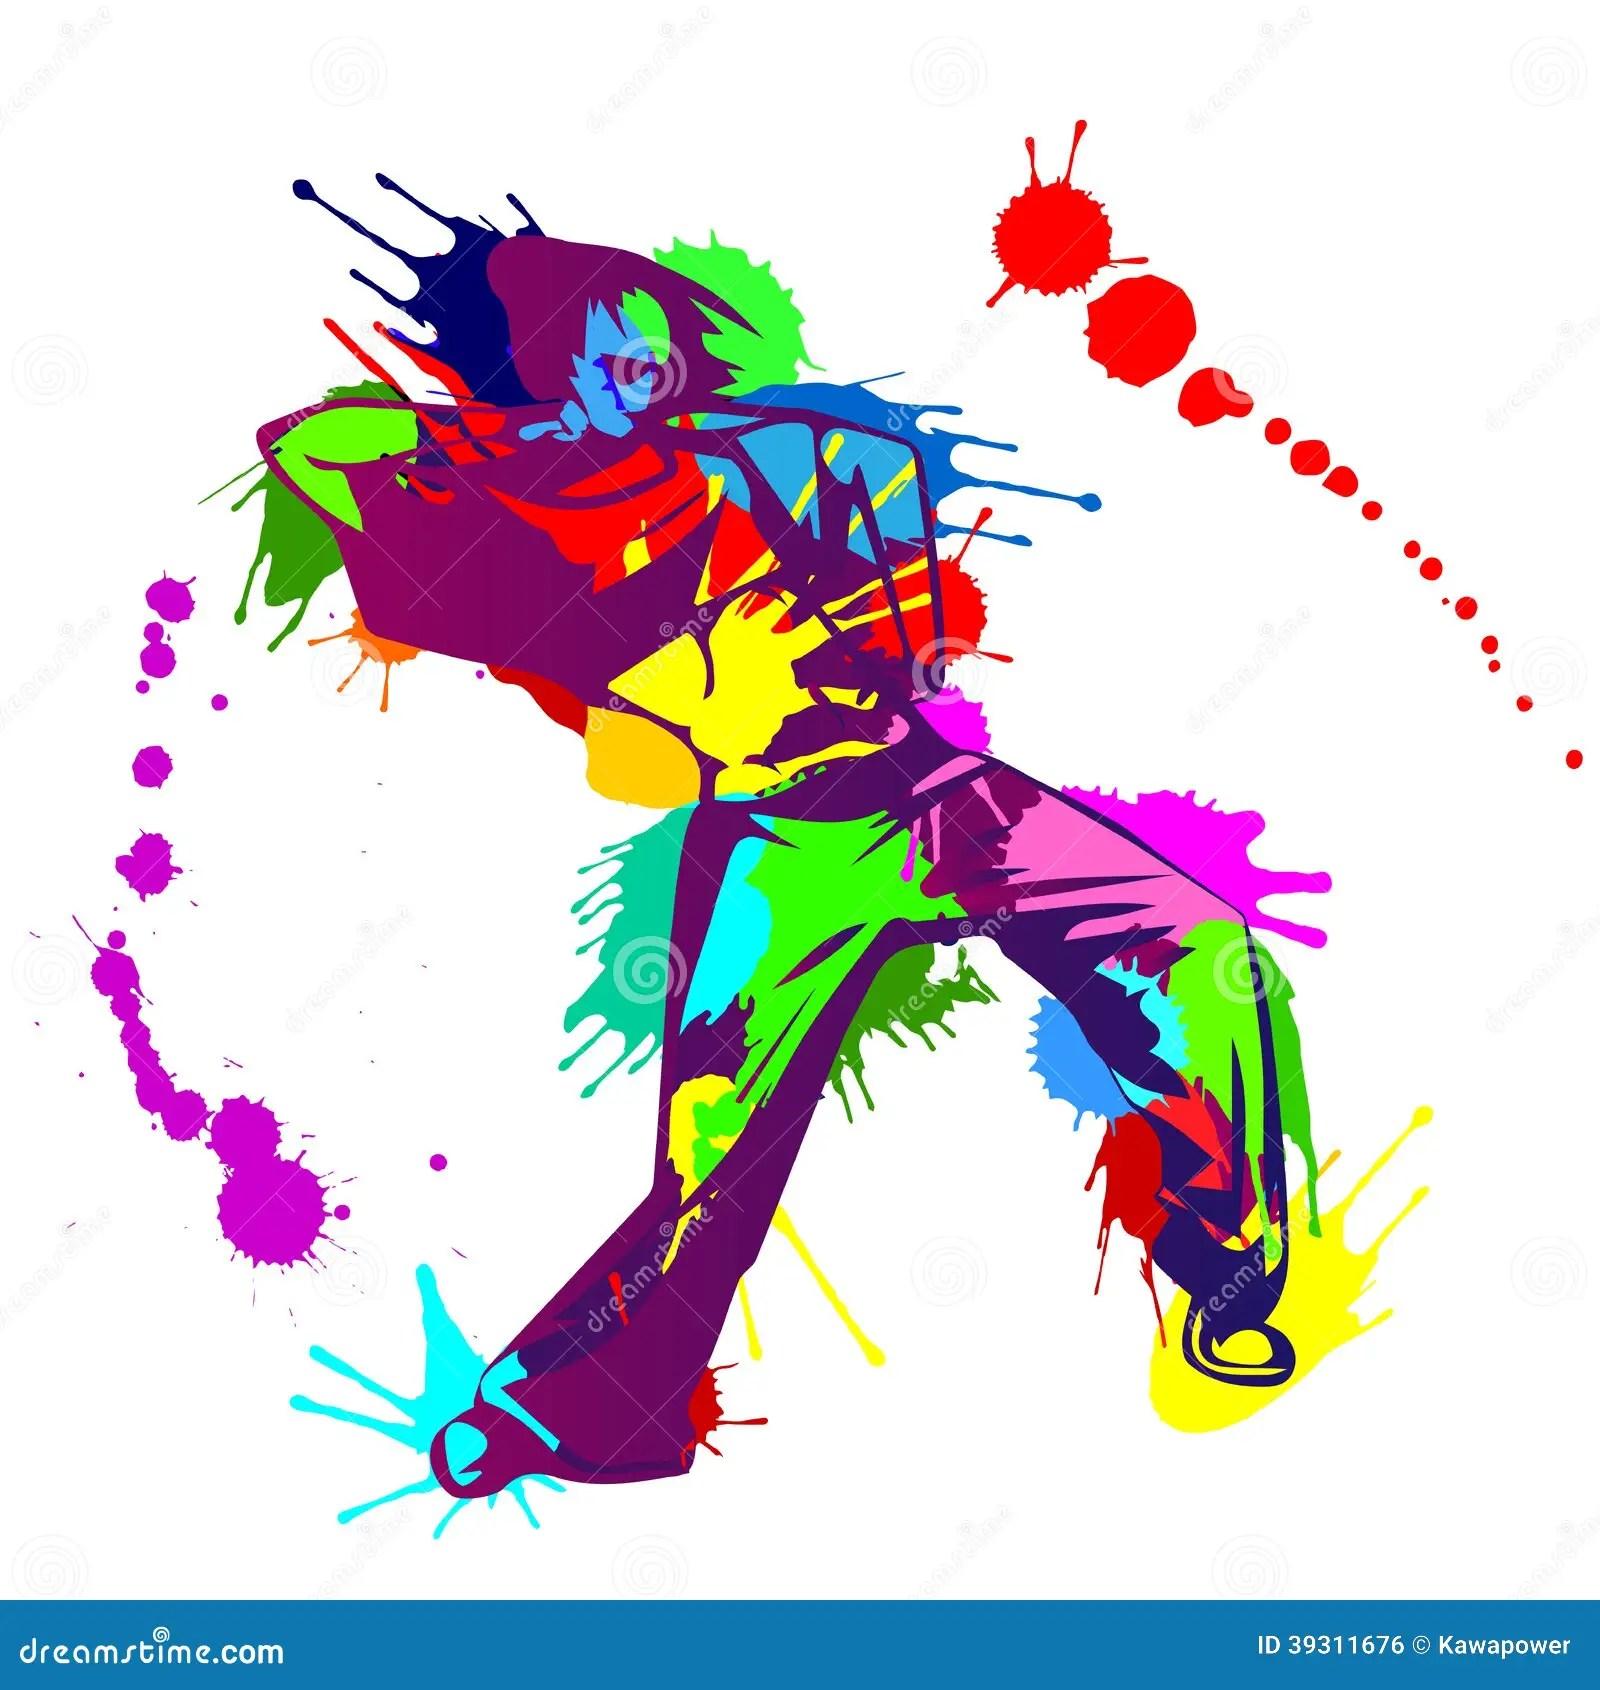 Boy Kick Girl Wallpaper Girl Hip Hop Dancer With Colorful Paint Splashes Stock